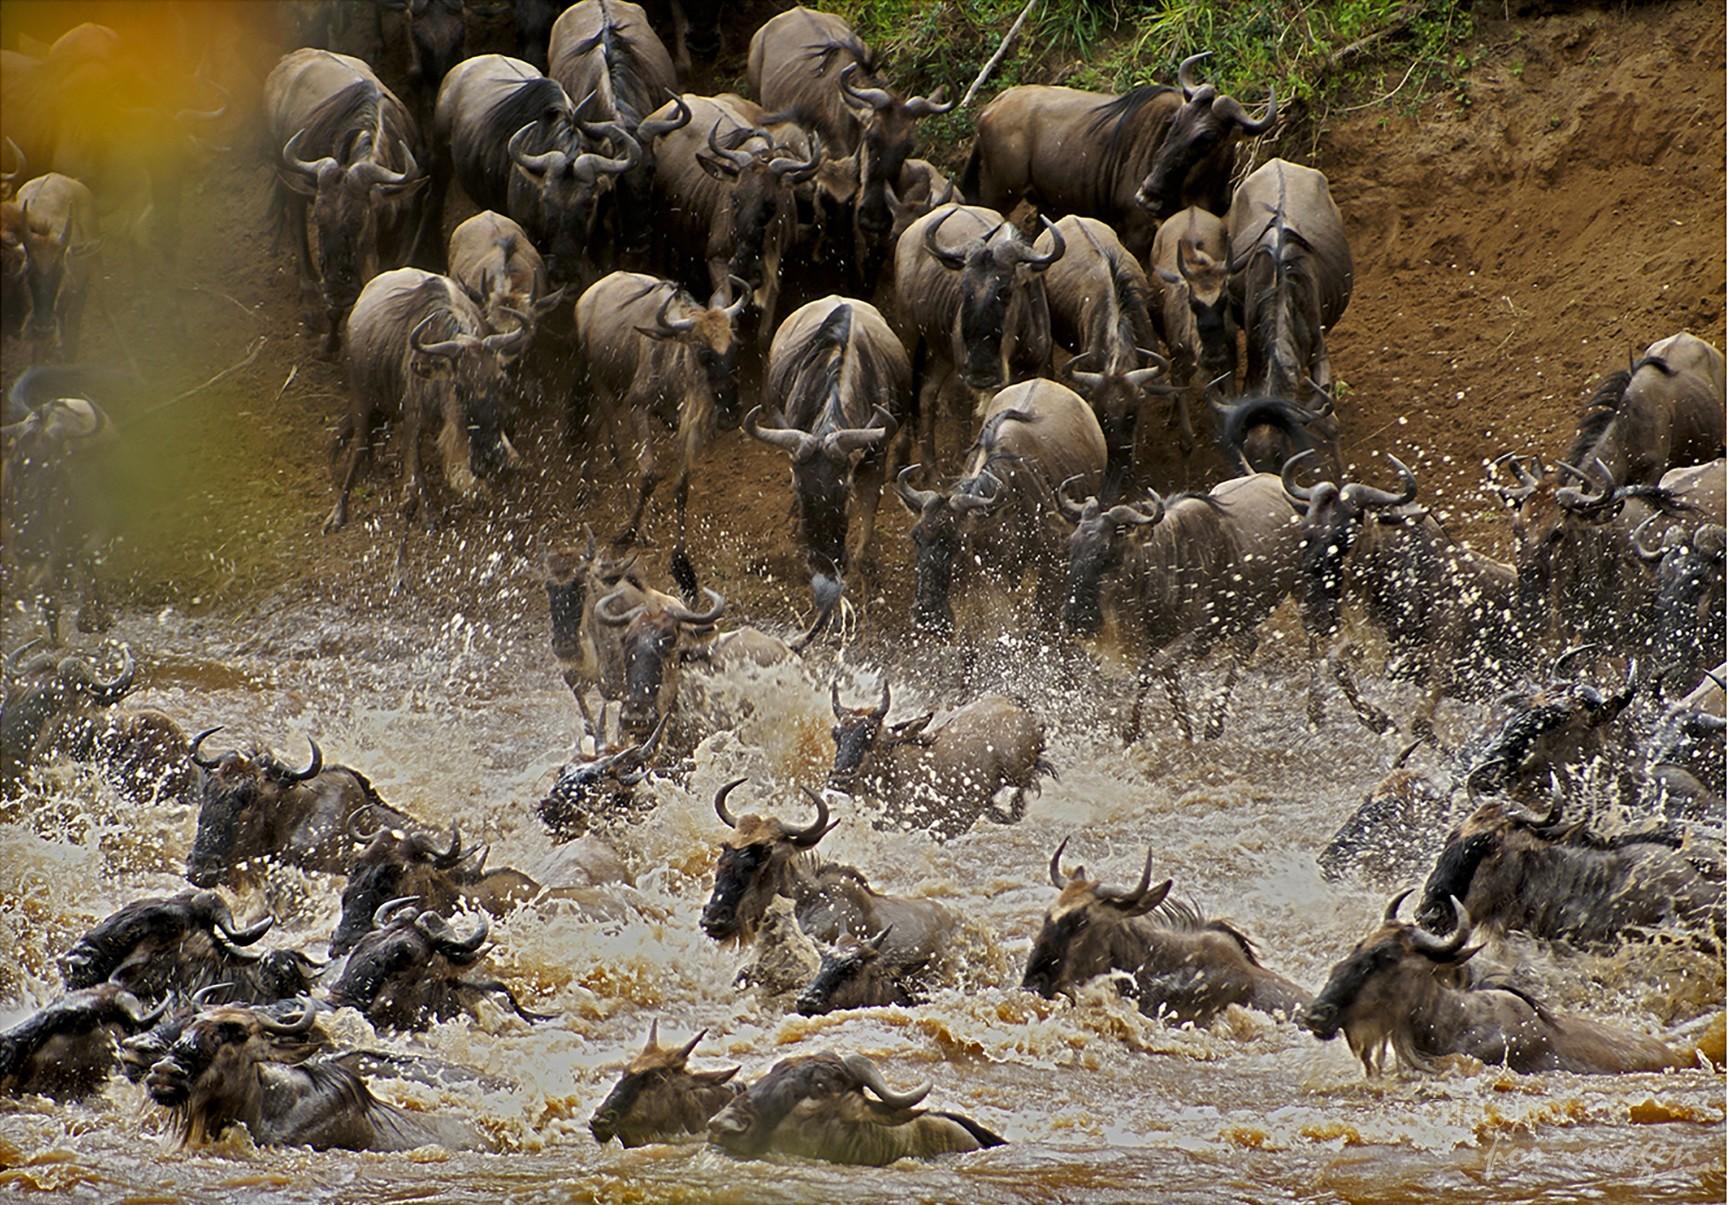 Ñuss cruzando el Río Massai Mara Kenya / Graciela Lavado